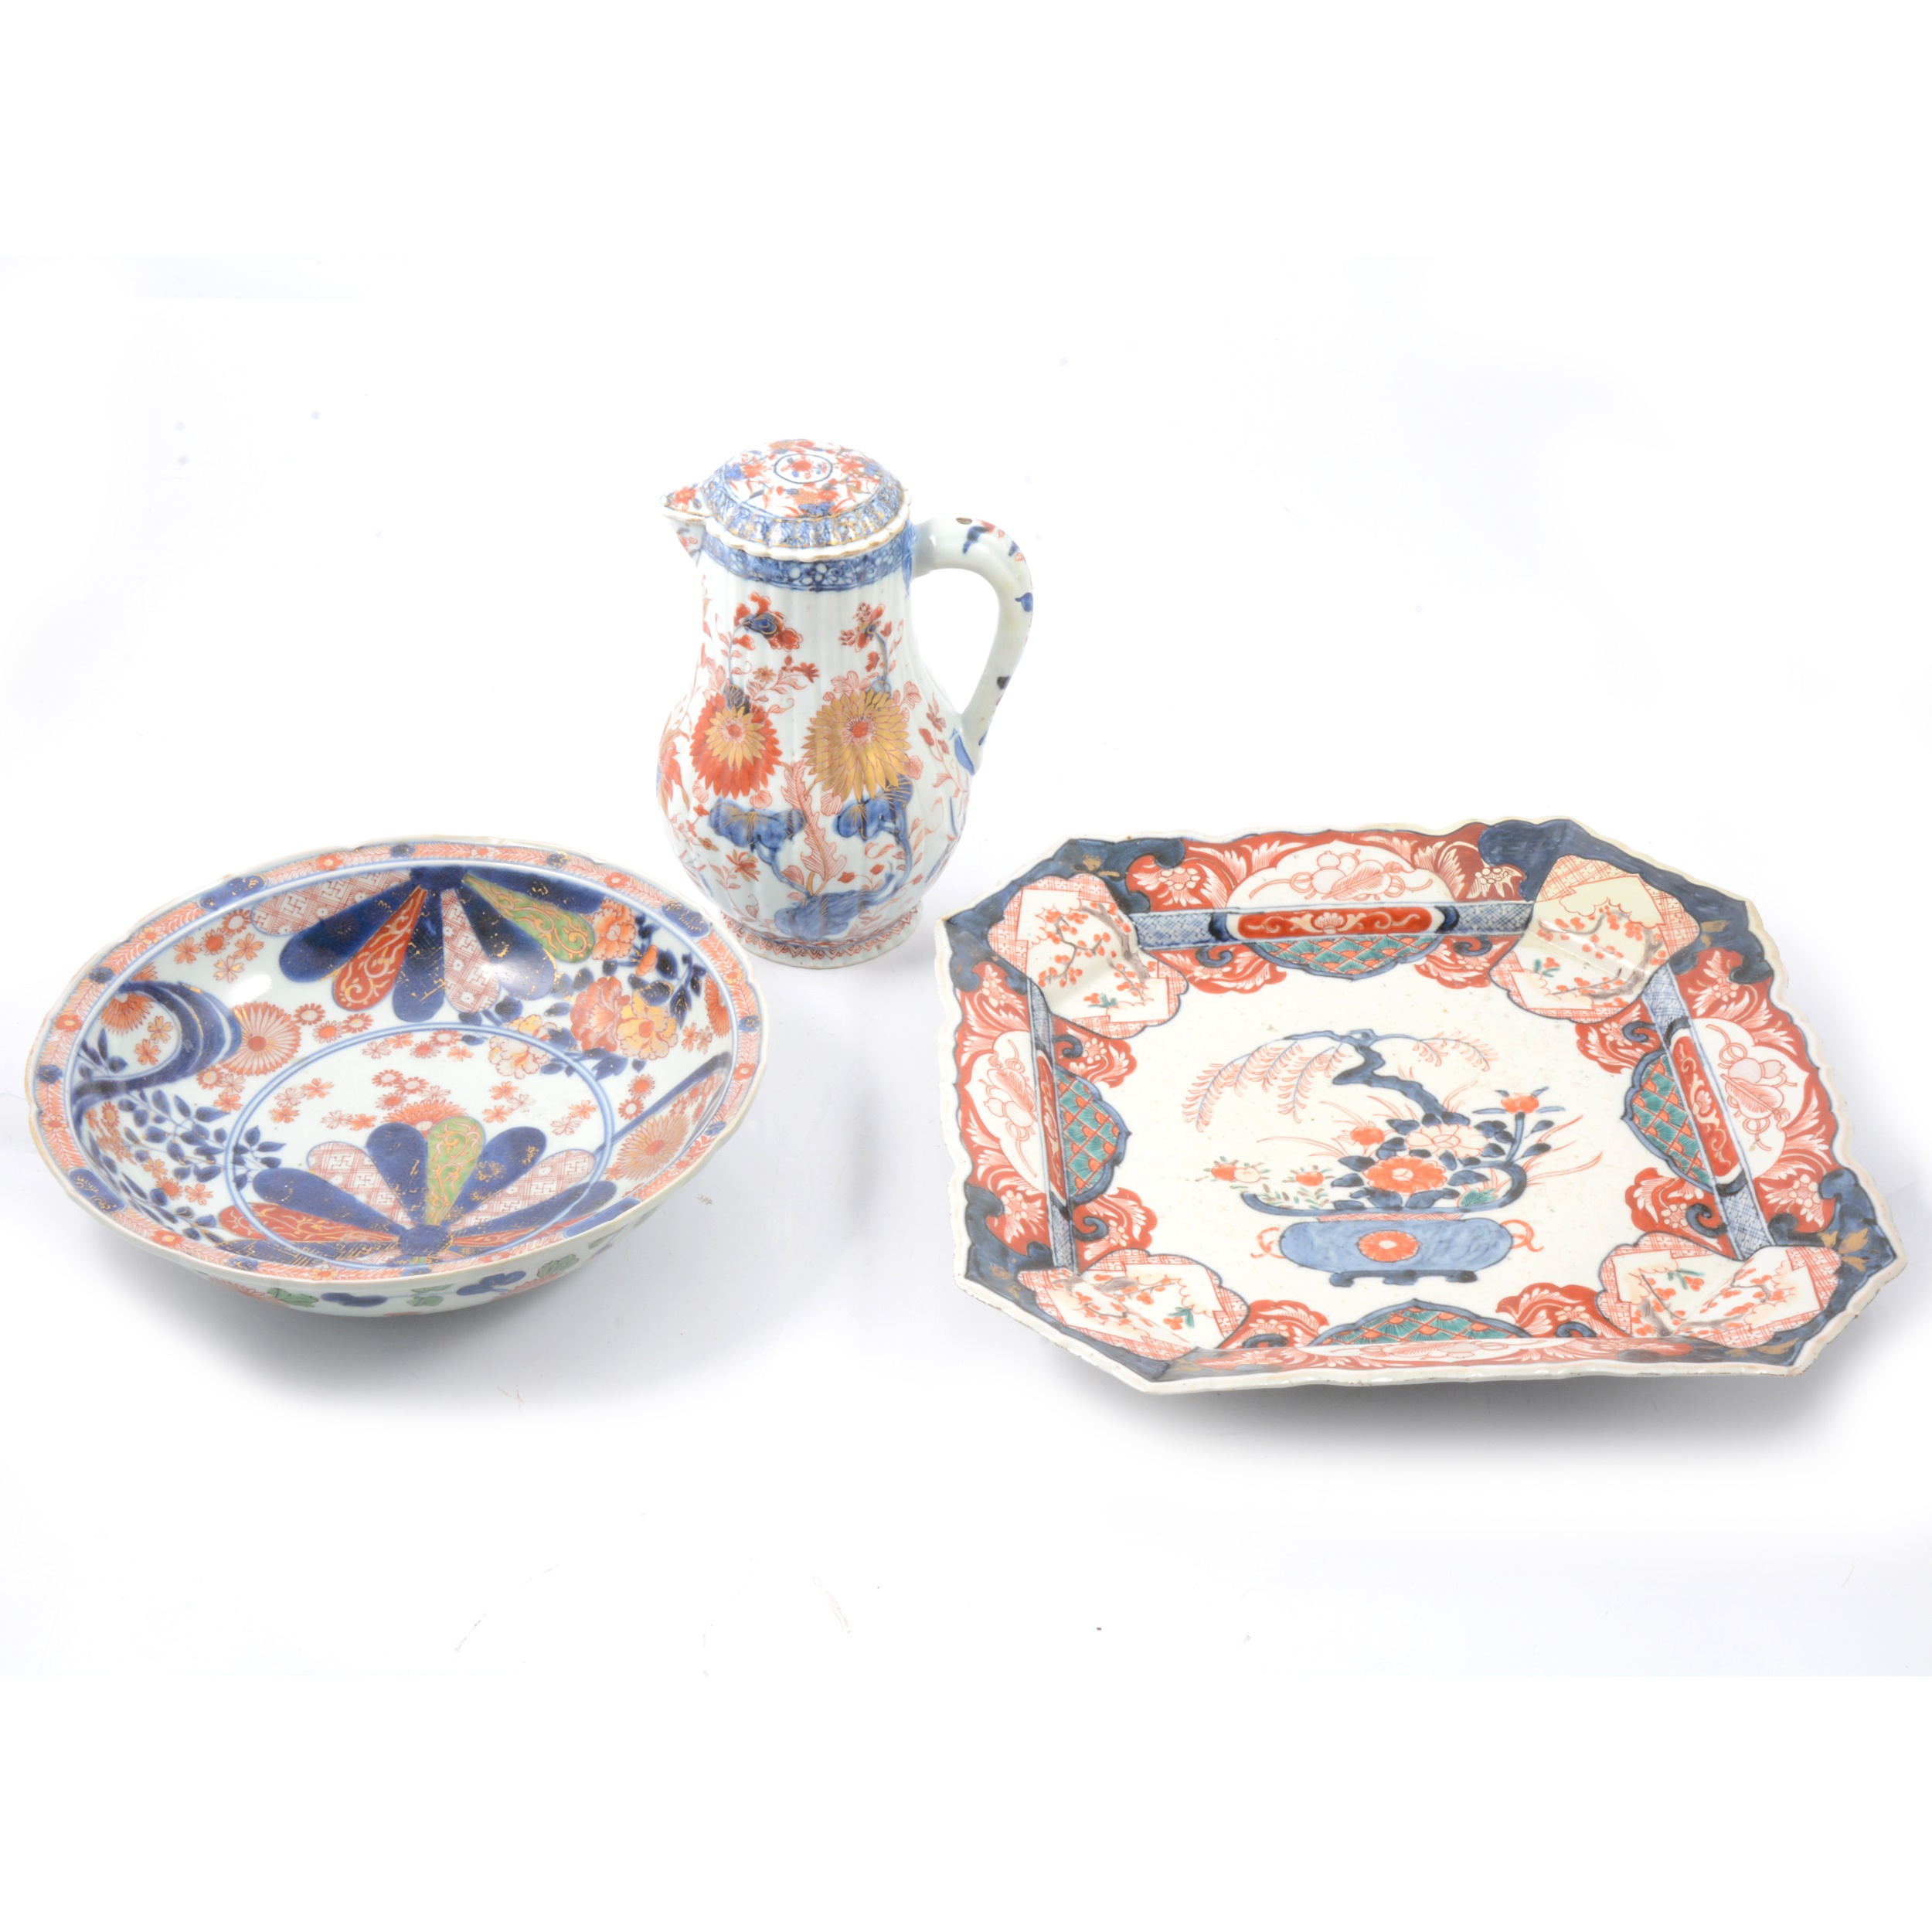 Imari pattern charger, bowl and ewer.